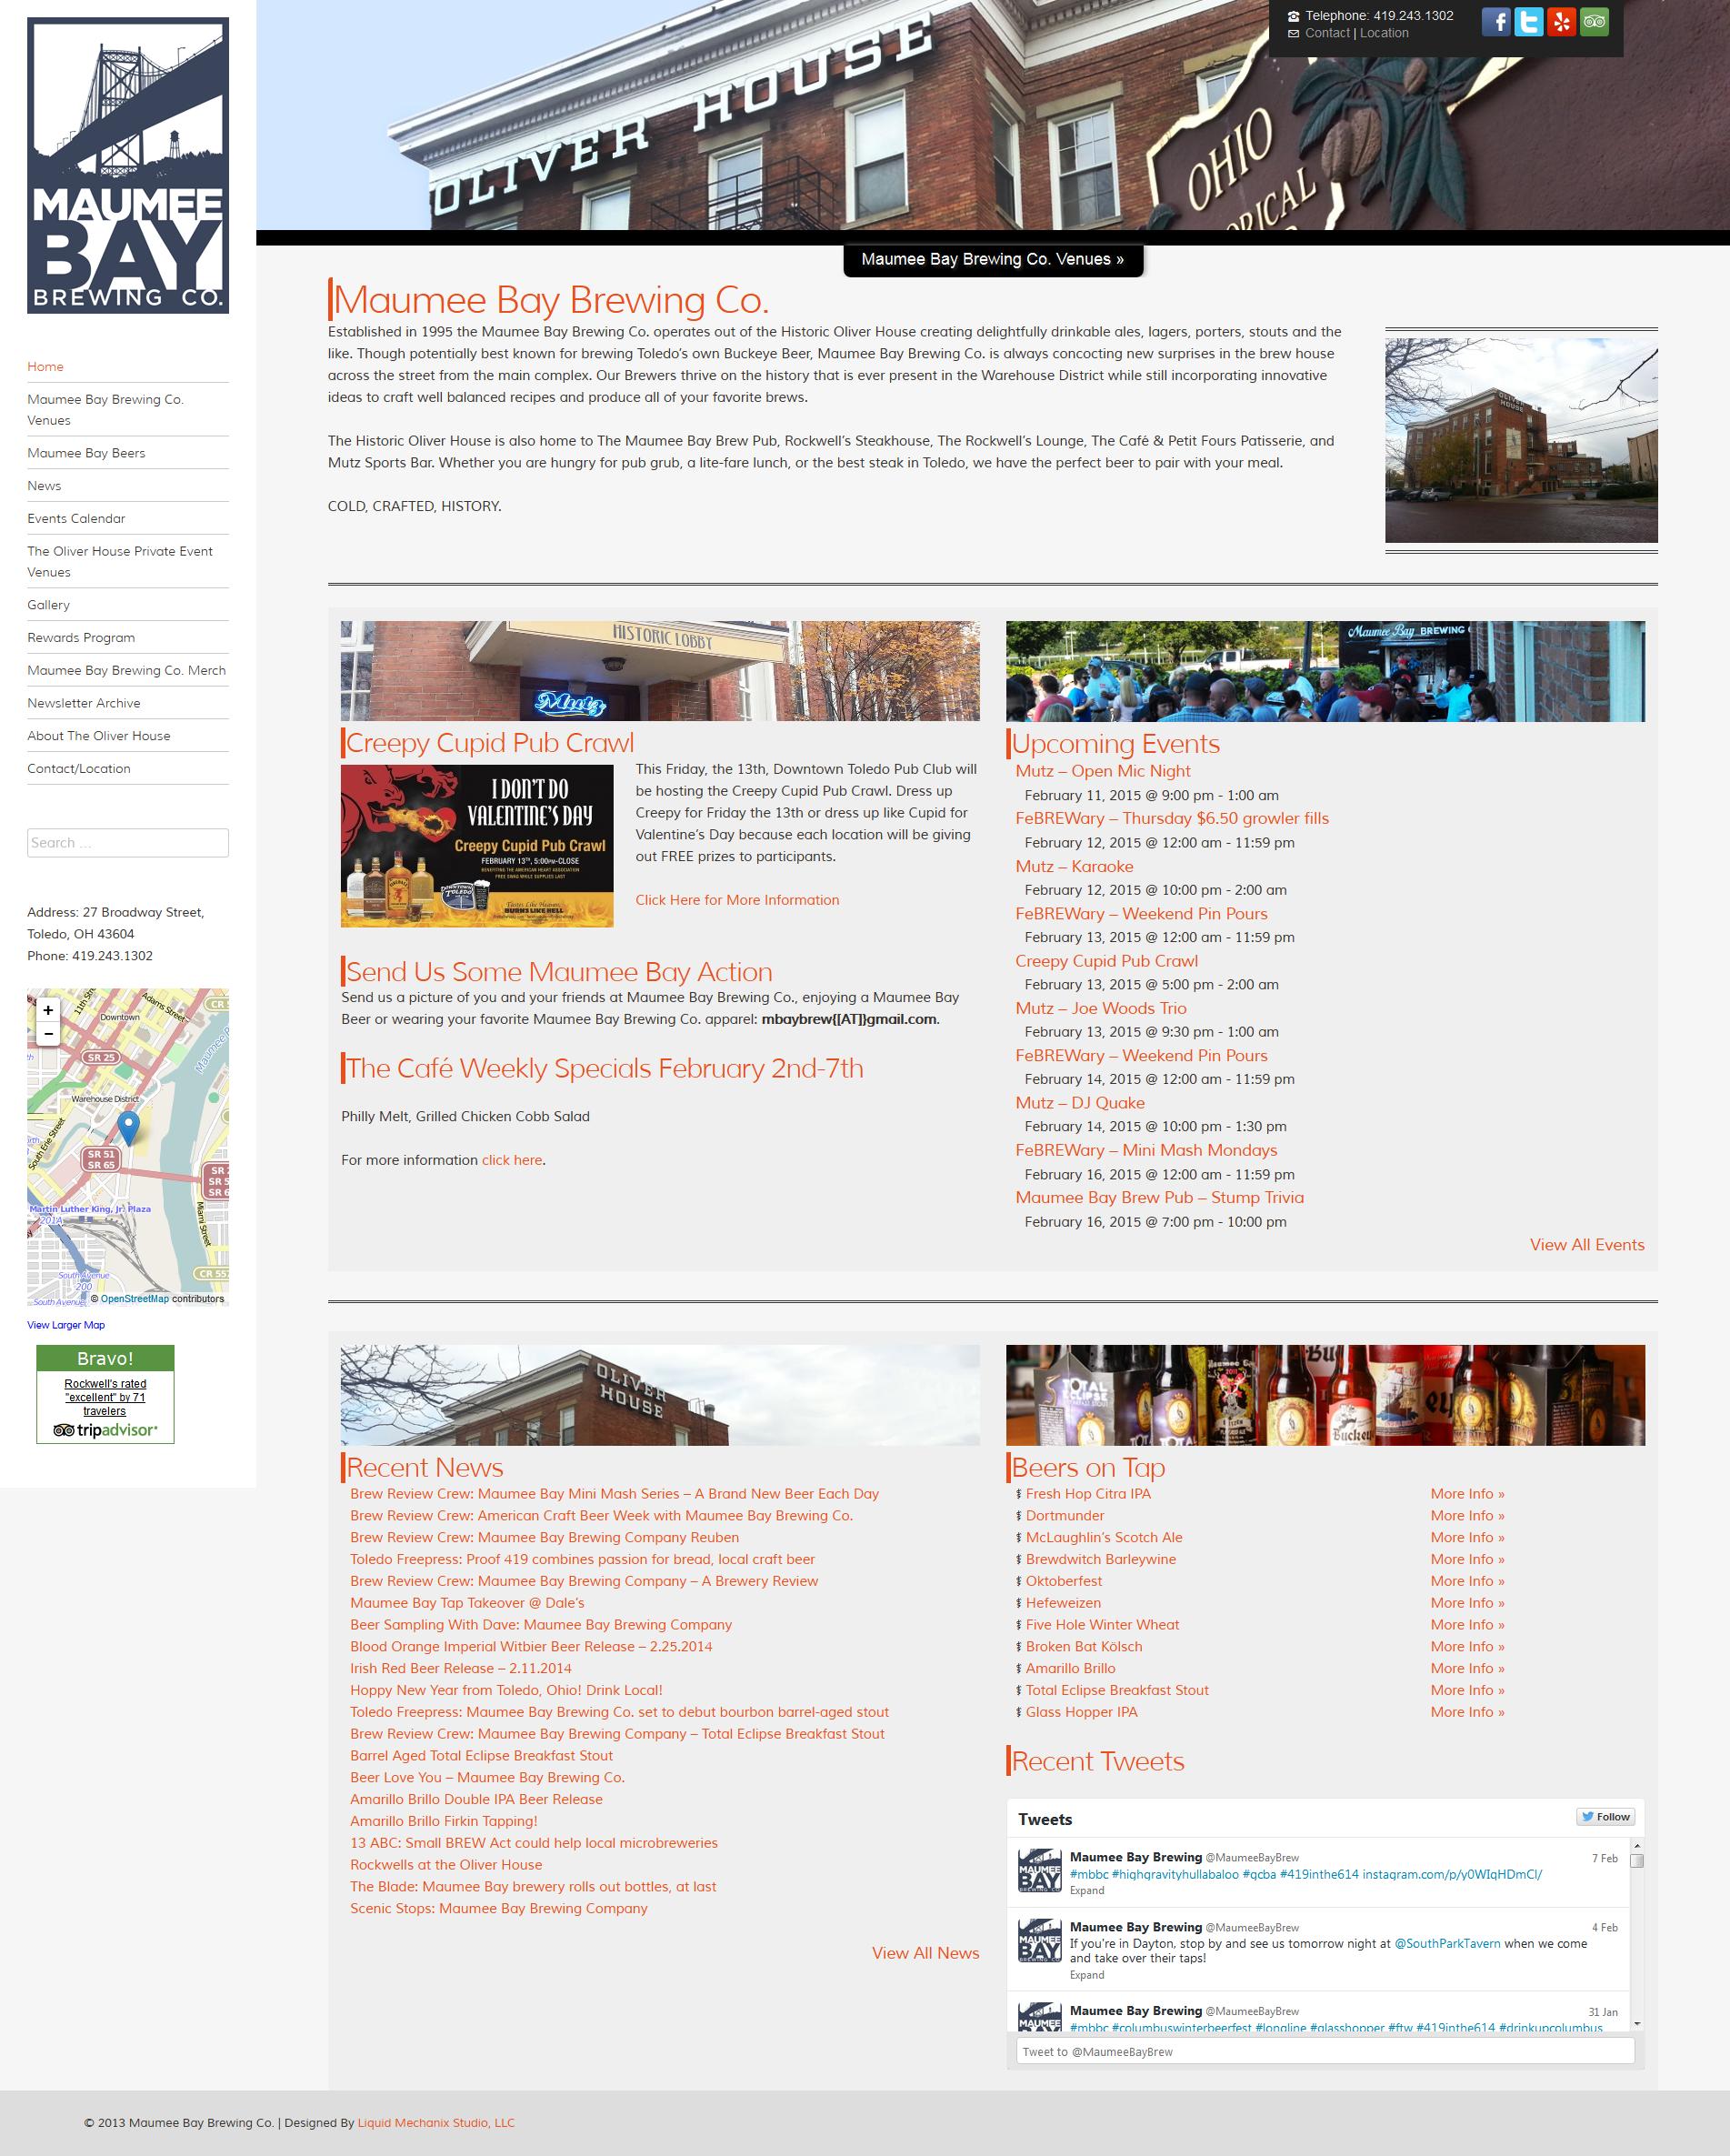 Maumee_Bay_Brewing_Co._Maumee_Bay_Brewing_Co._-_2015-02-12_18.42.11.png